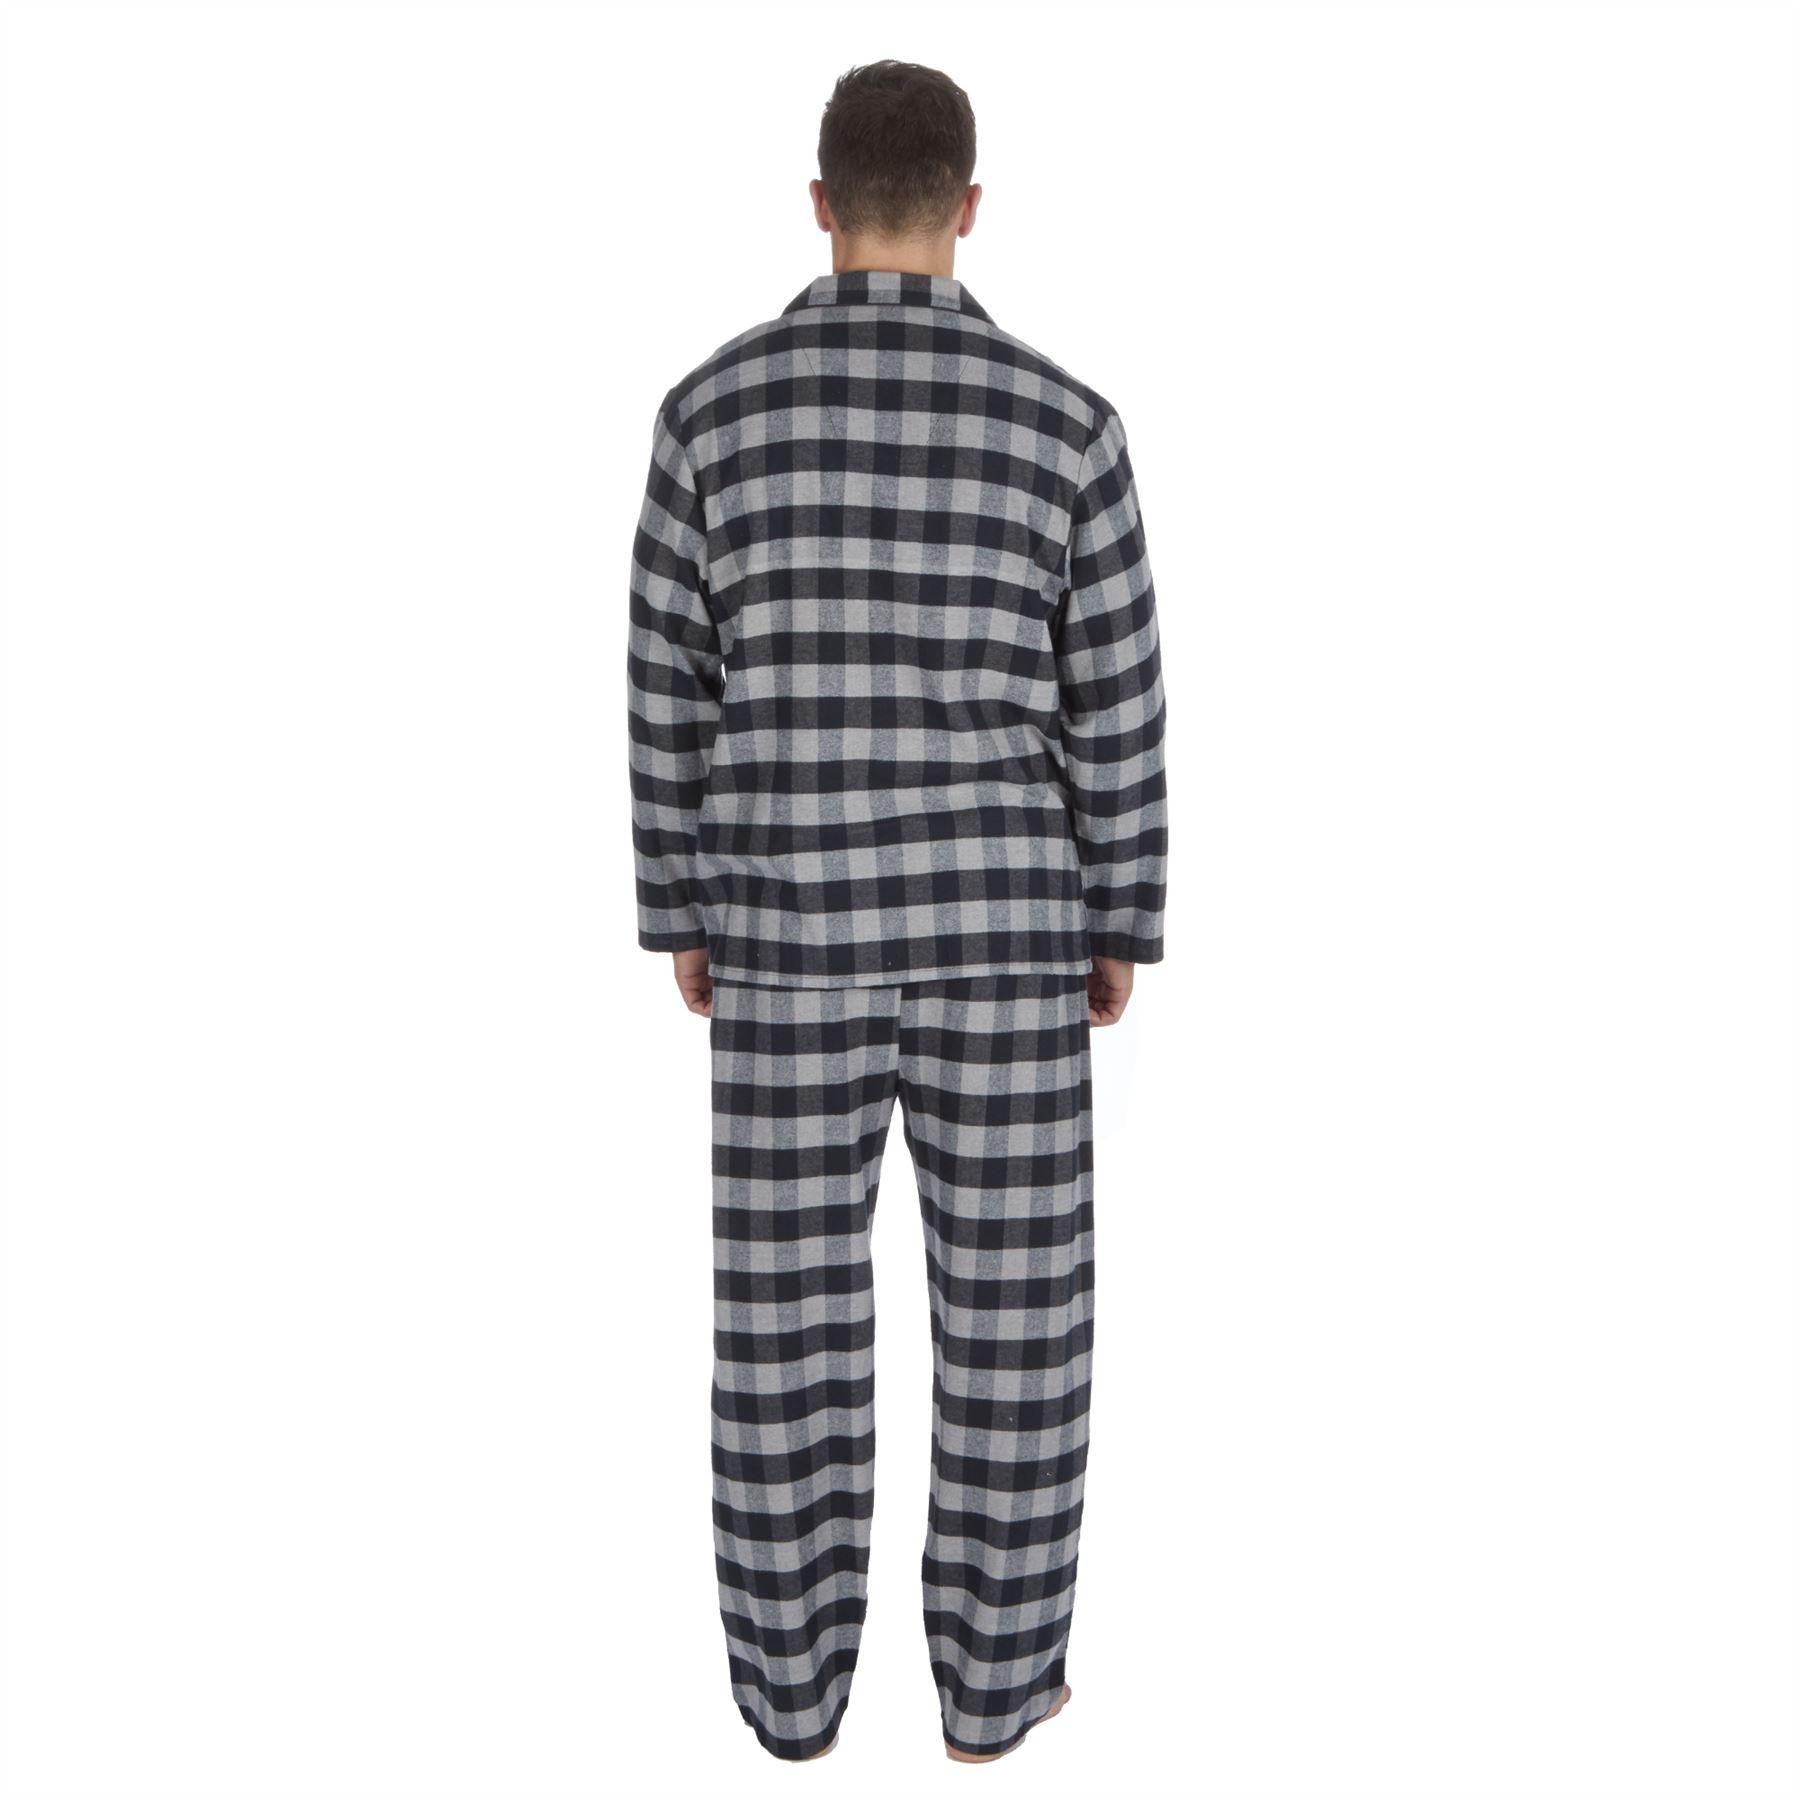 thumbnail 8 - Mens-Boys-100-Cotton-Flannel-Long-Sleeved-Pyjamas-Pyjama-Set-Check-Size-M-XXL